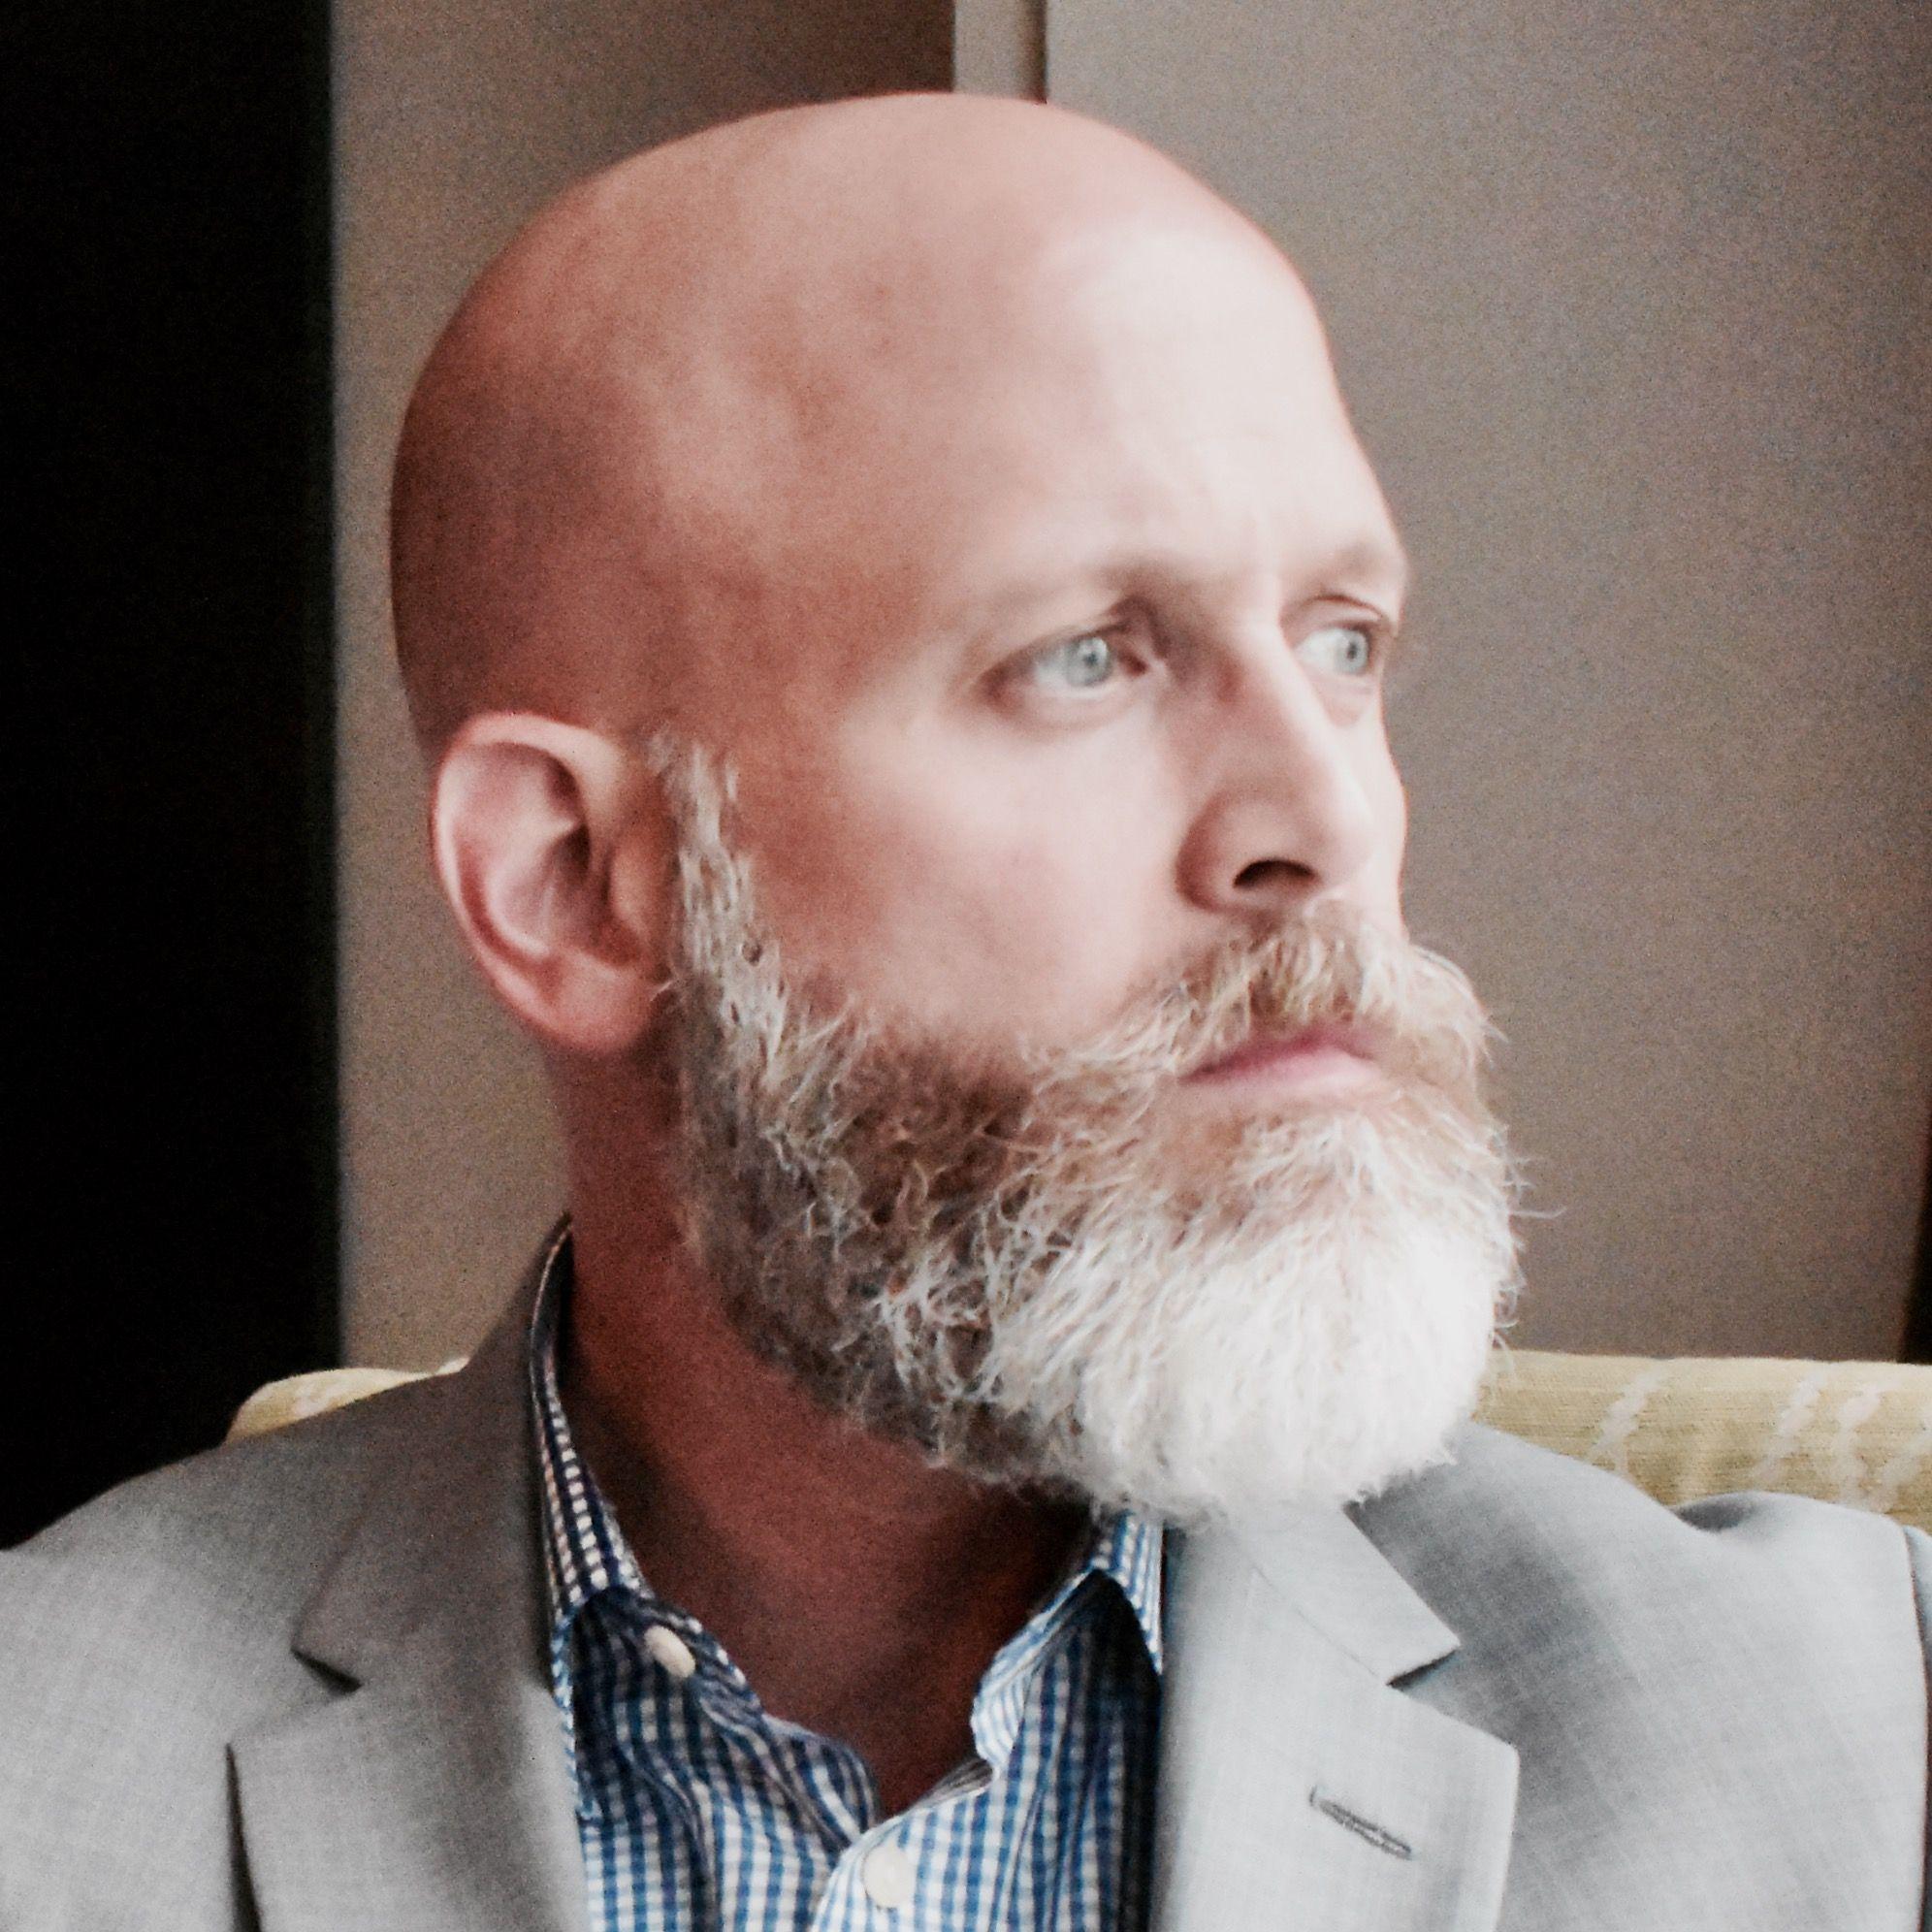 Bald And Grey Beard Grey Beards Bald With Beard Beard Styles Bald